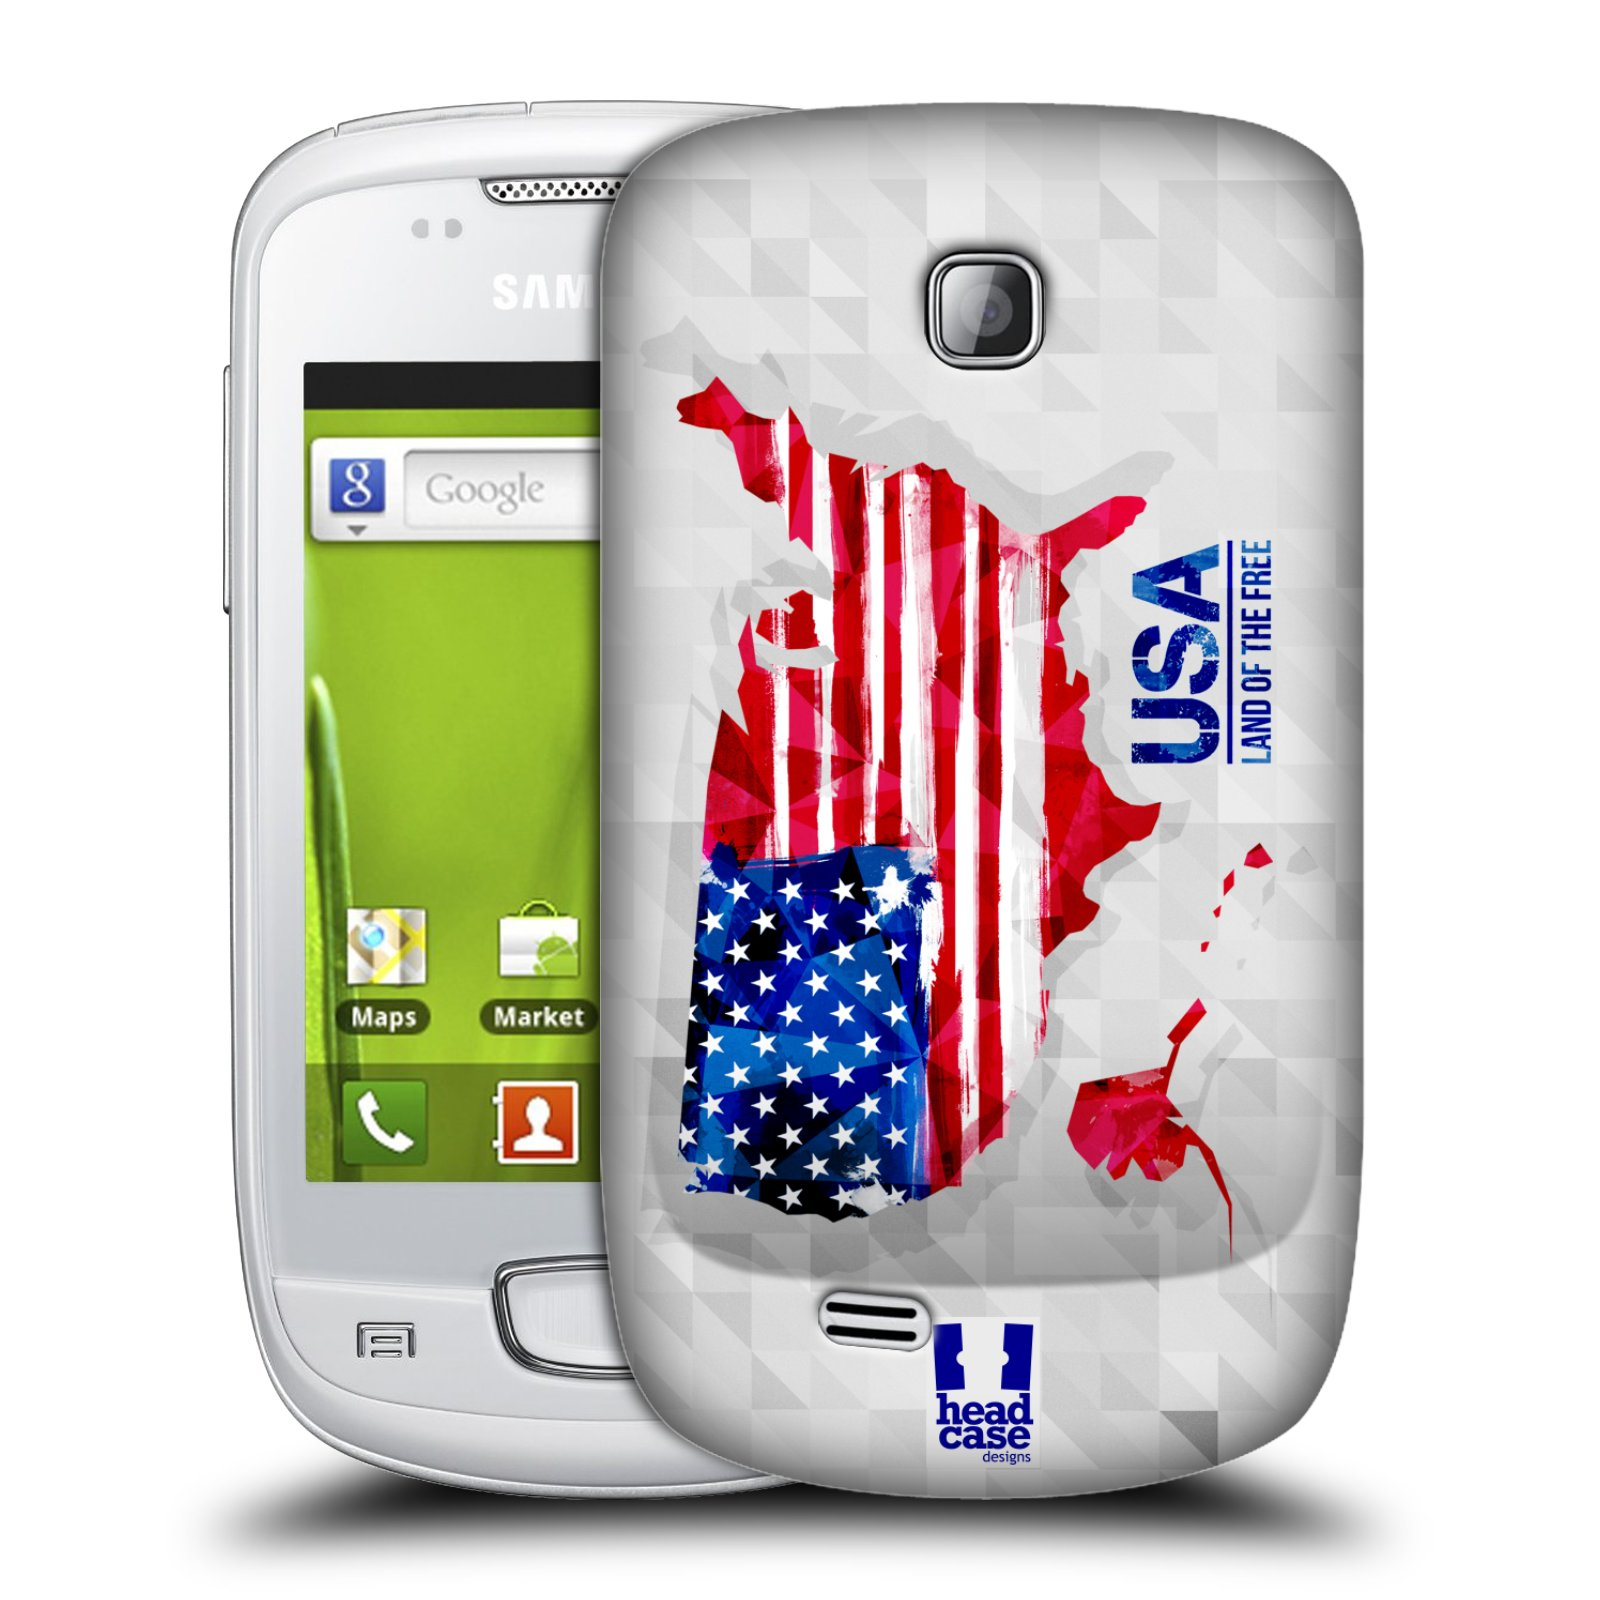 Plastové pouzdro na mobil Samsung Galaxy Mini HEAD CASE GEOMAPA USA (Kryt či obal na mobilní telefon Samsung Galaxy Mini GT-S5570 / GT-S5570i)